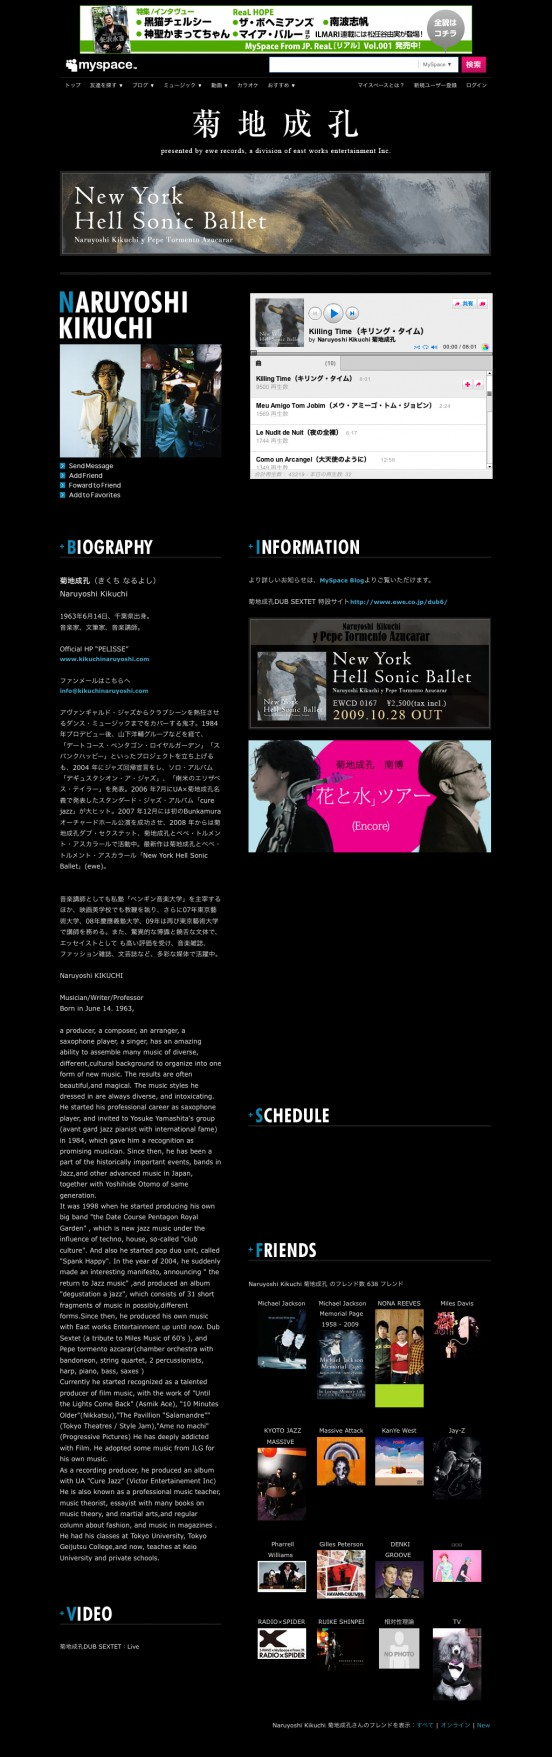 Naruyoshi Kikuchi 菊地成孔 - MySpace -